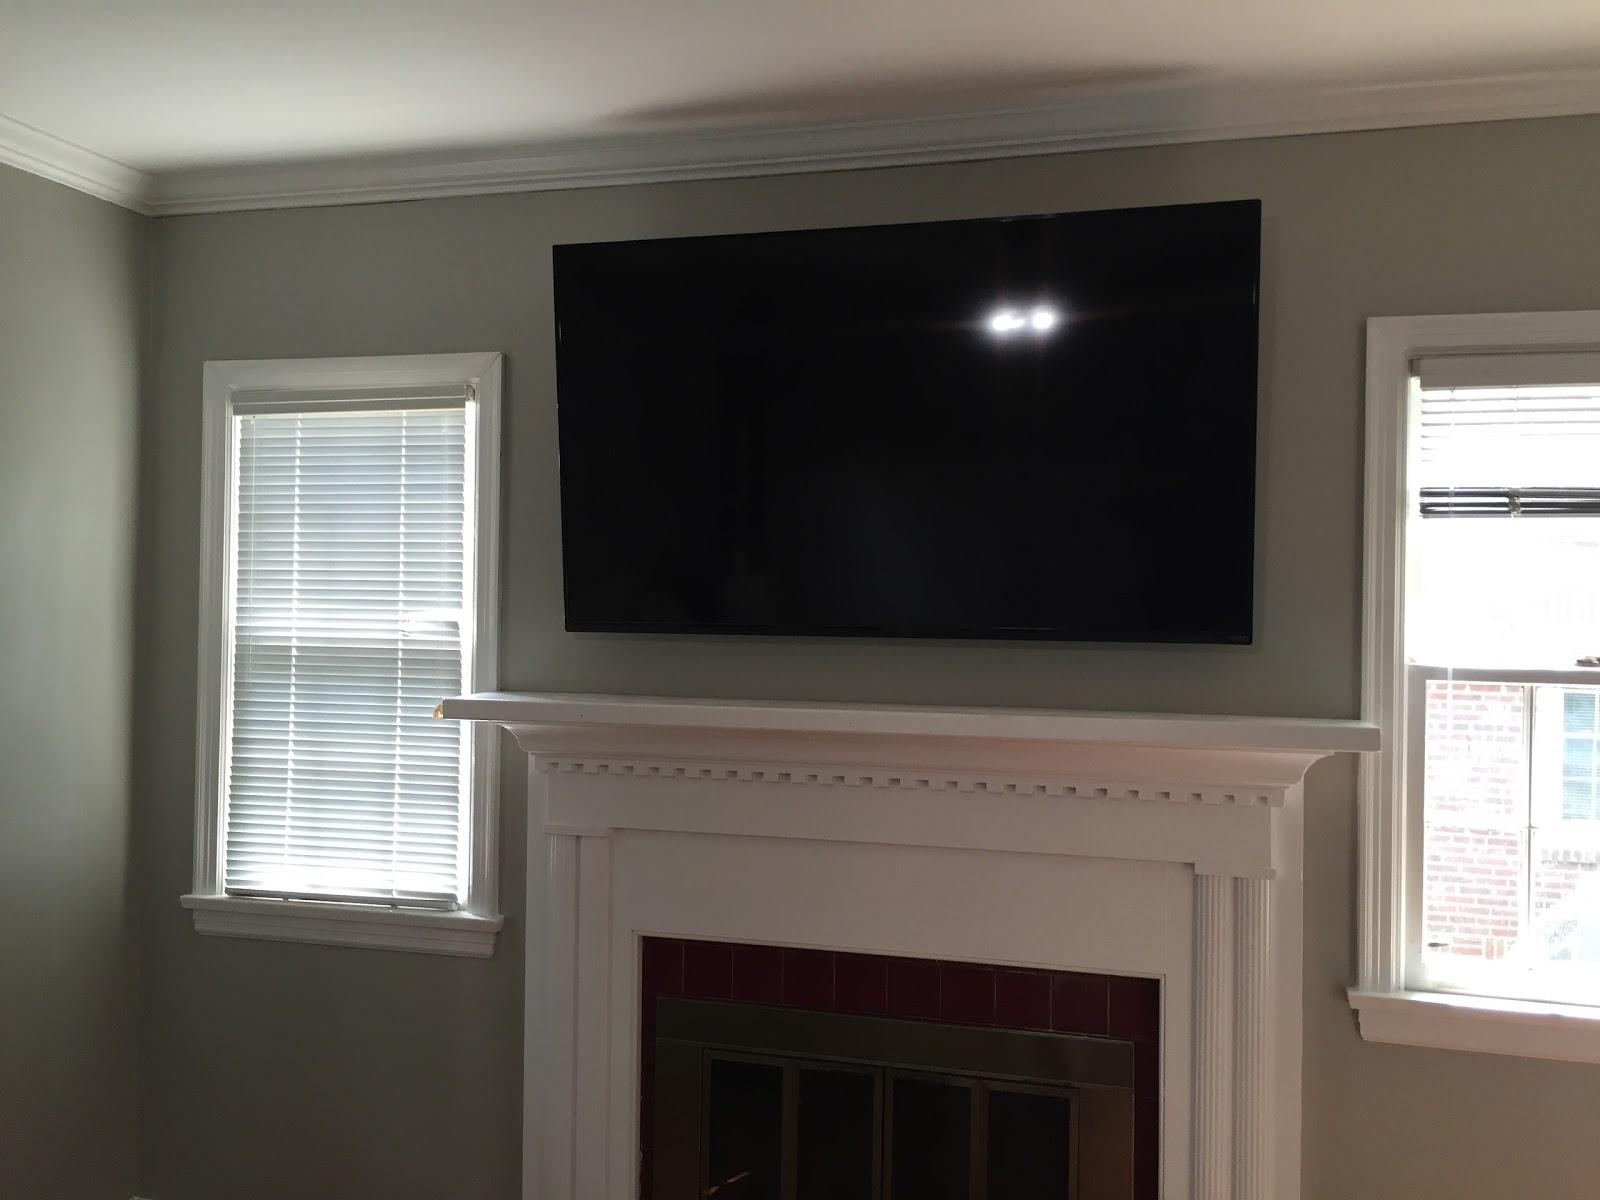 TV Wall Mounting Charlotte NC: TV Mounted on Brick Fireplace